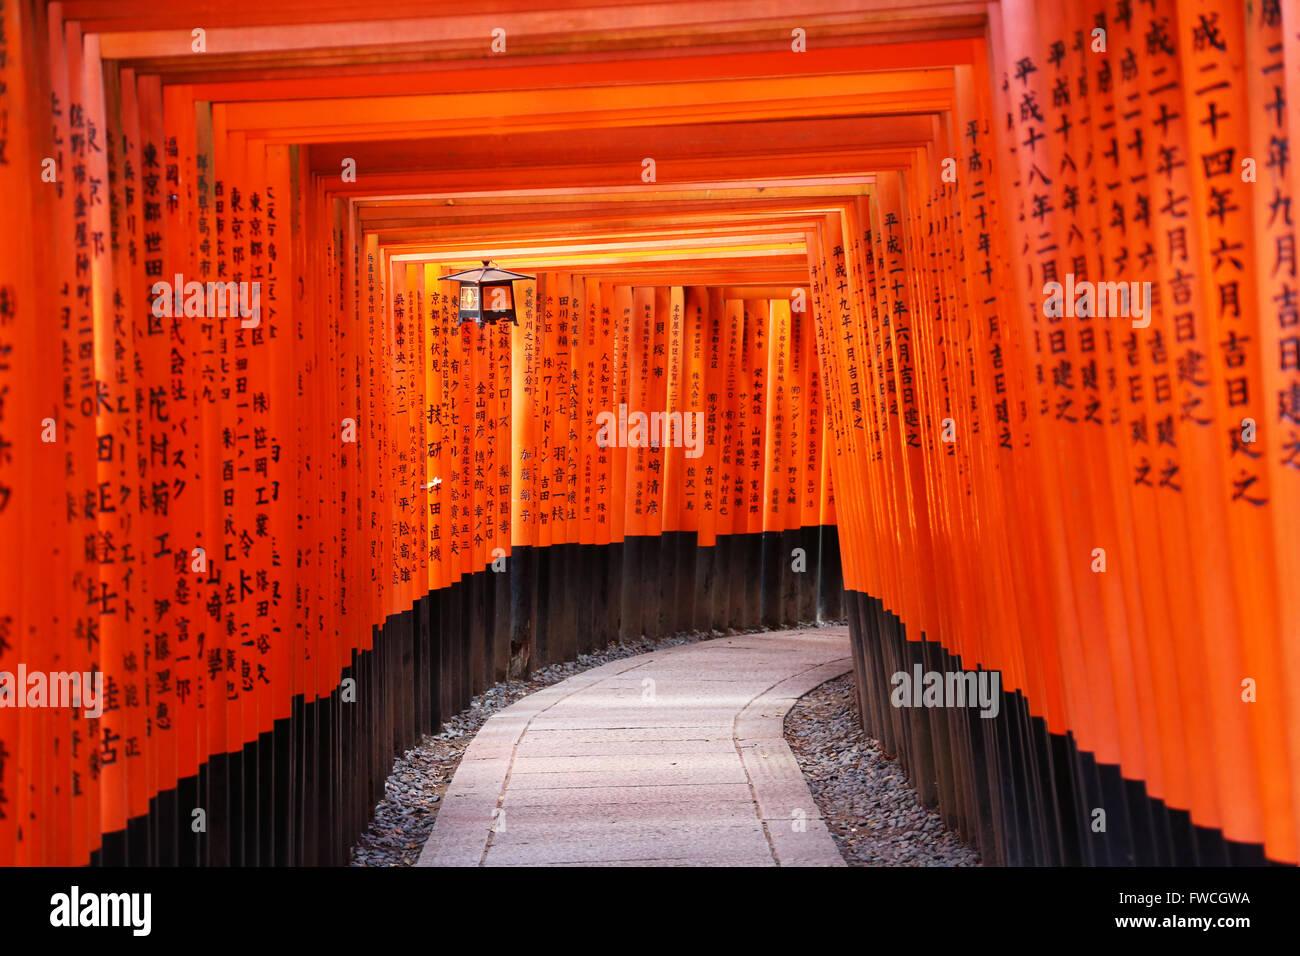 Senbon Torii, tunnels of red torii gates, at Fushimi Inari Shinto shrine in Kyoto, Japan - Stock Image